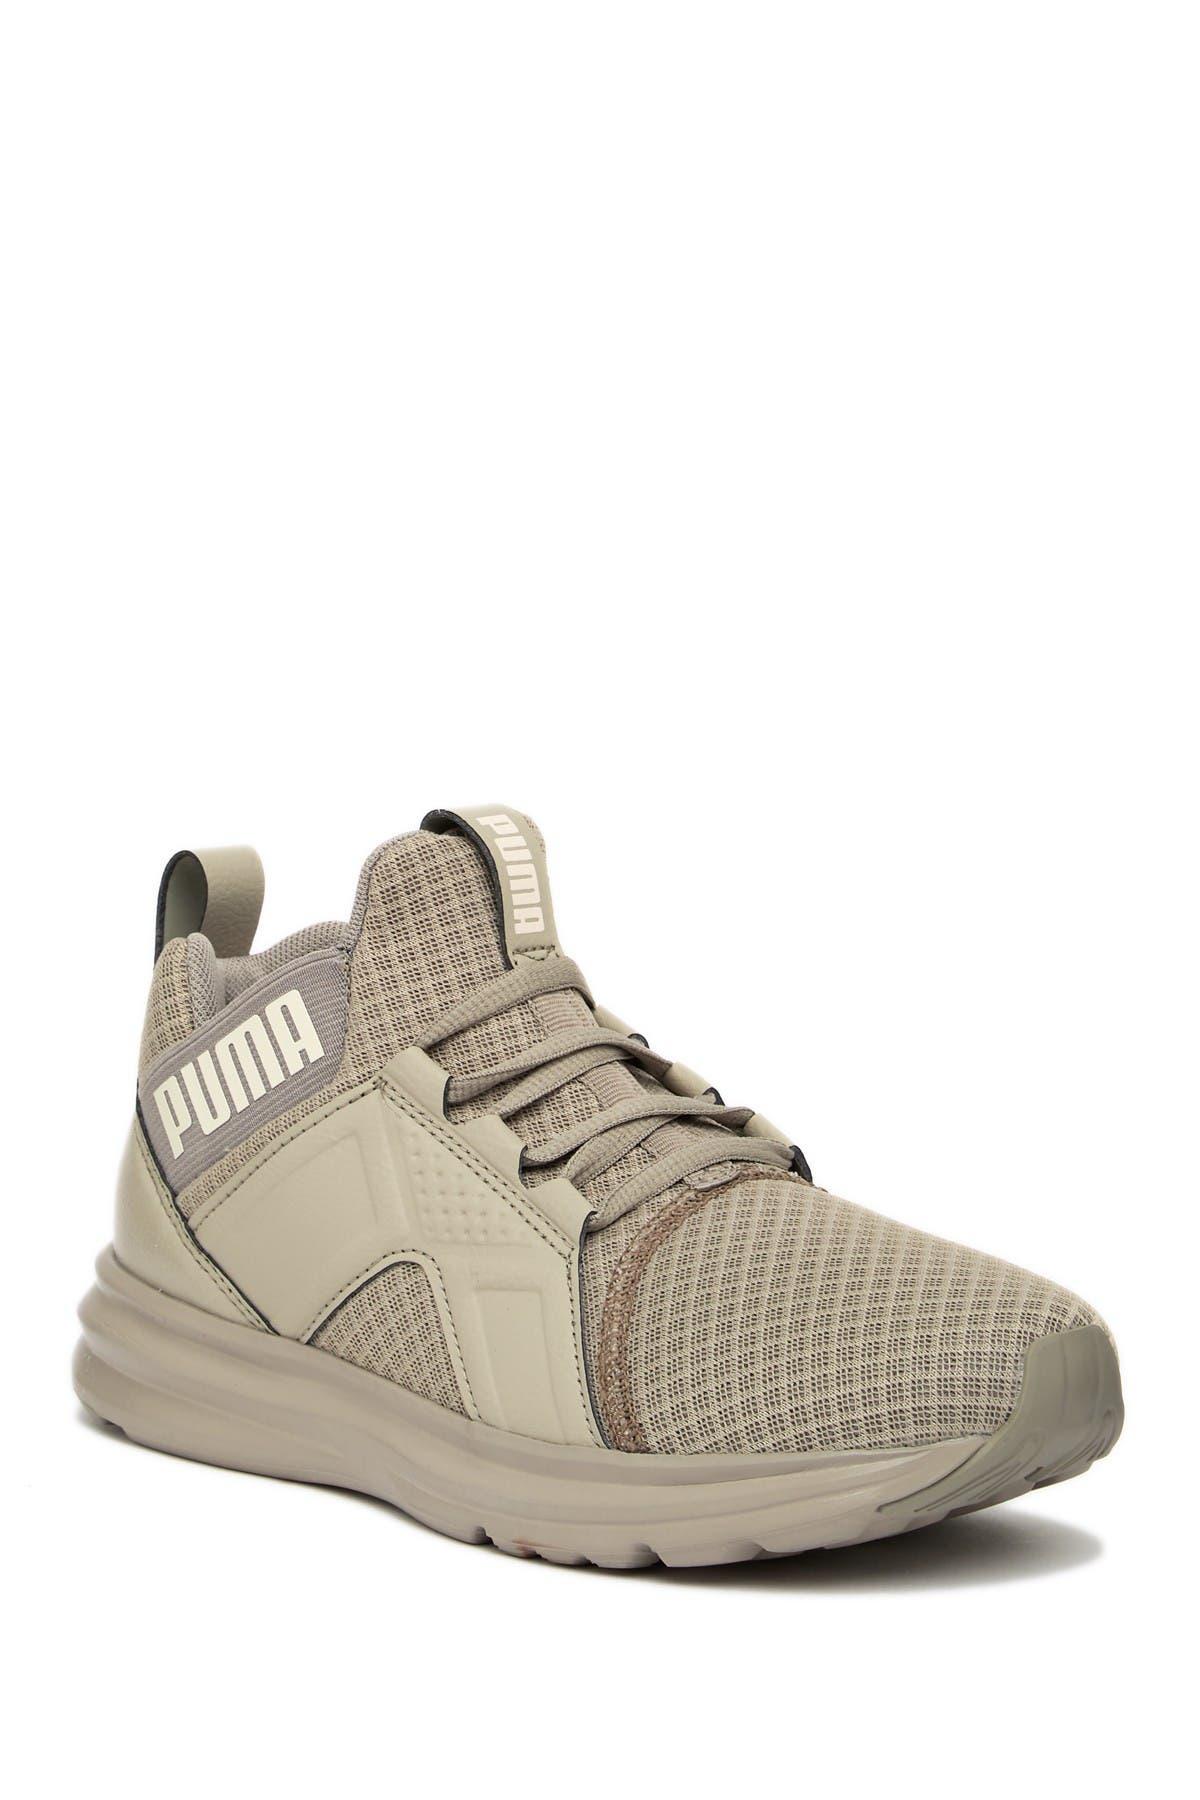 PUMA | Enzo Premium Mesh Sneaker